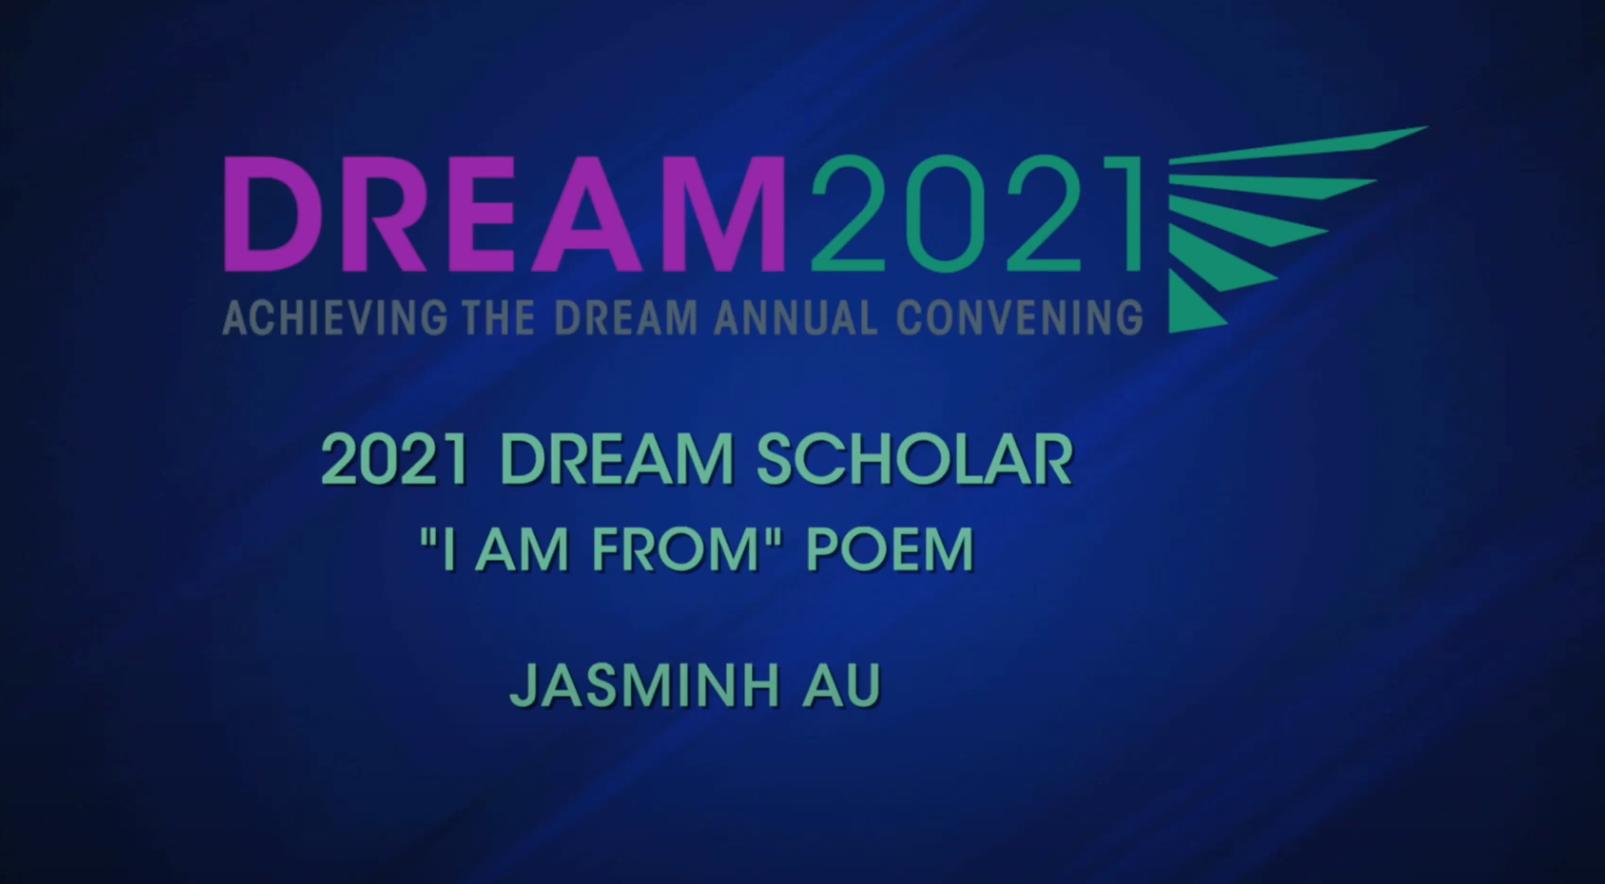 Jasminh Au I Am From Poem